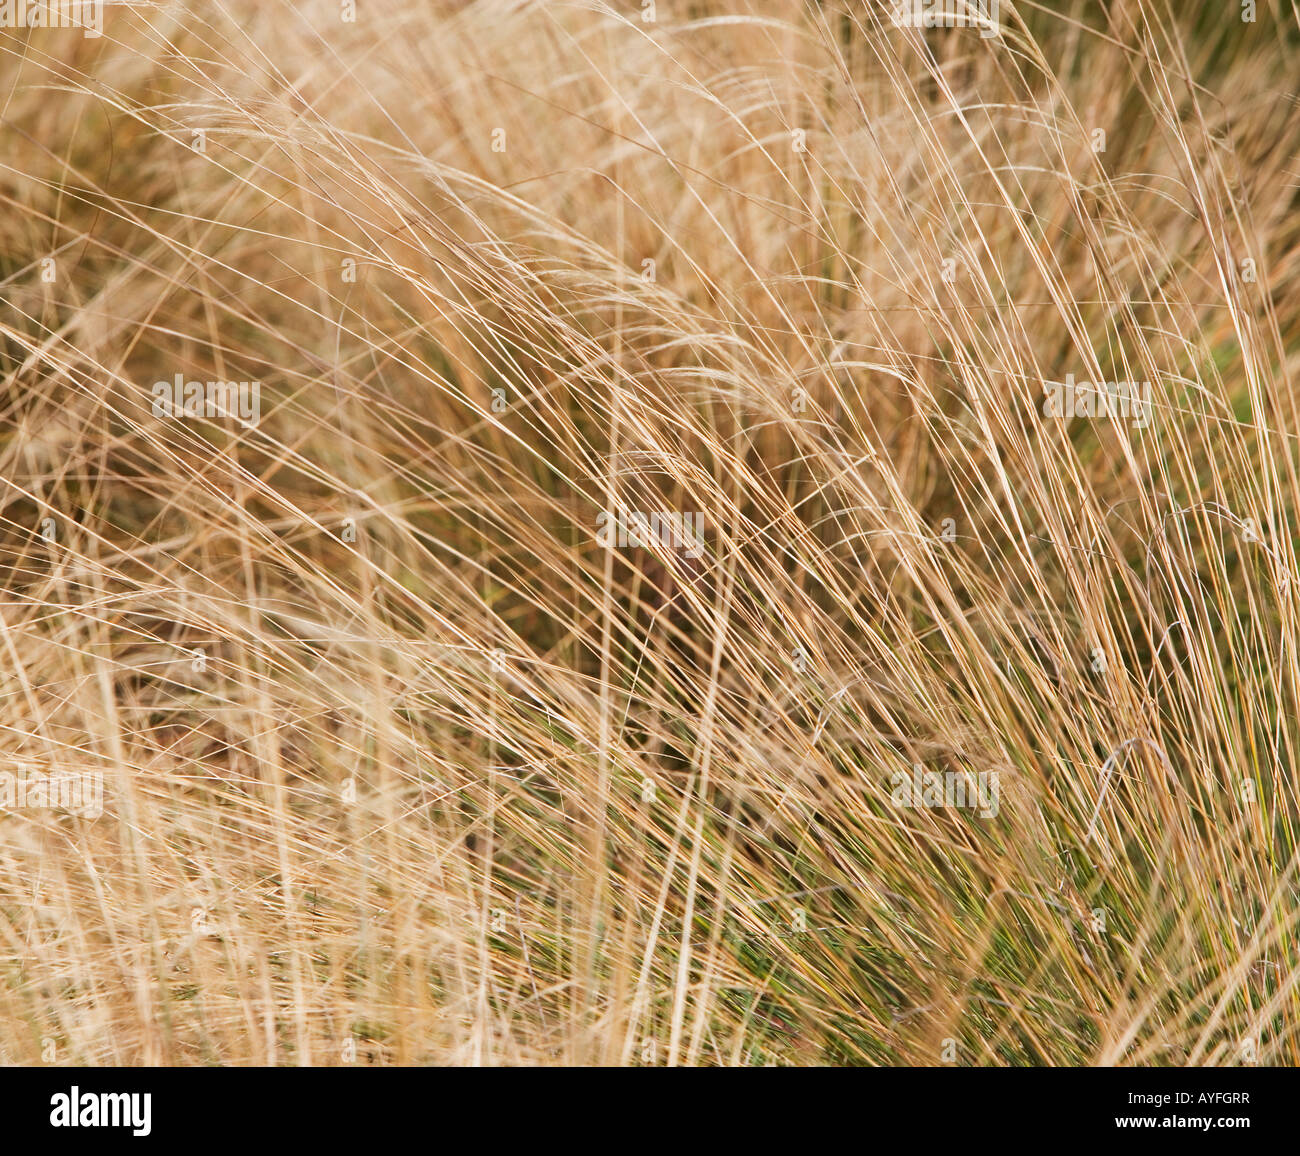 beach grass scene - Stock Image